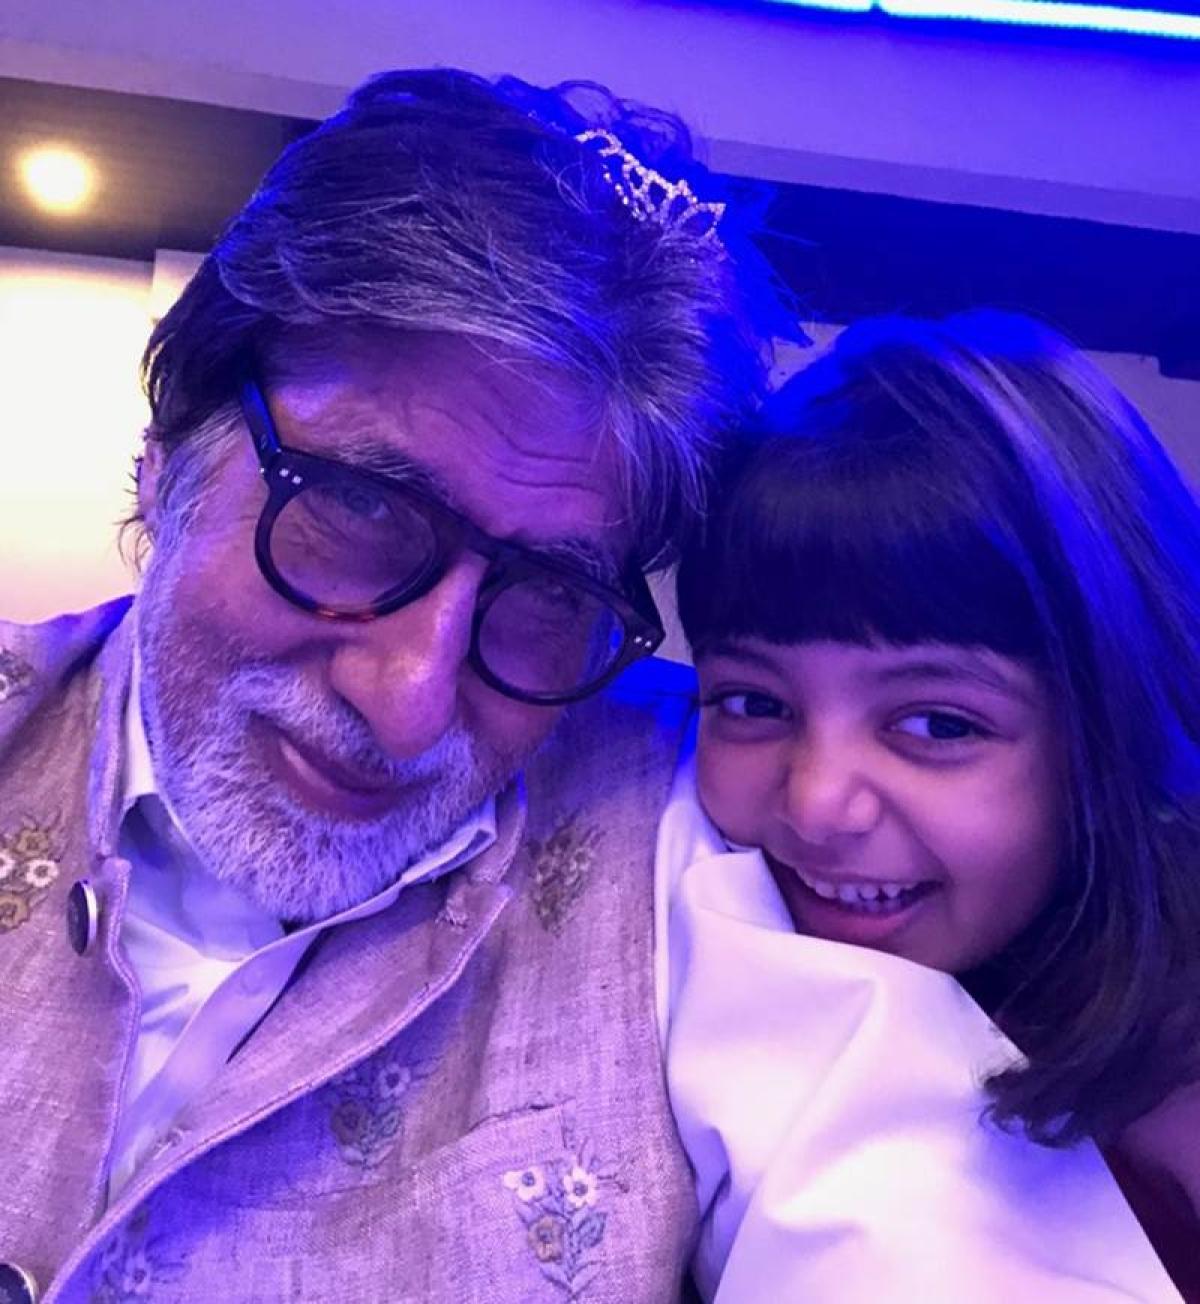 See pics: Amitabh Bachchan celebrates New Year with his granddaughters Aaradhya, Navya Naveli Nanda